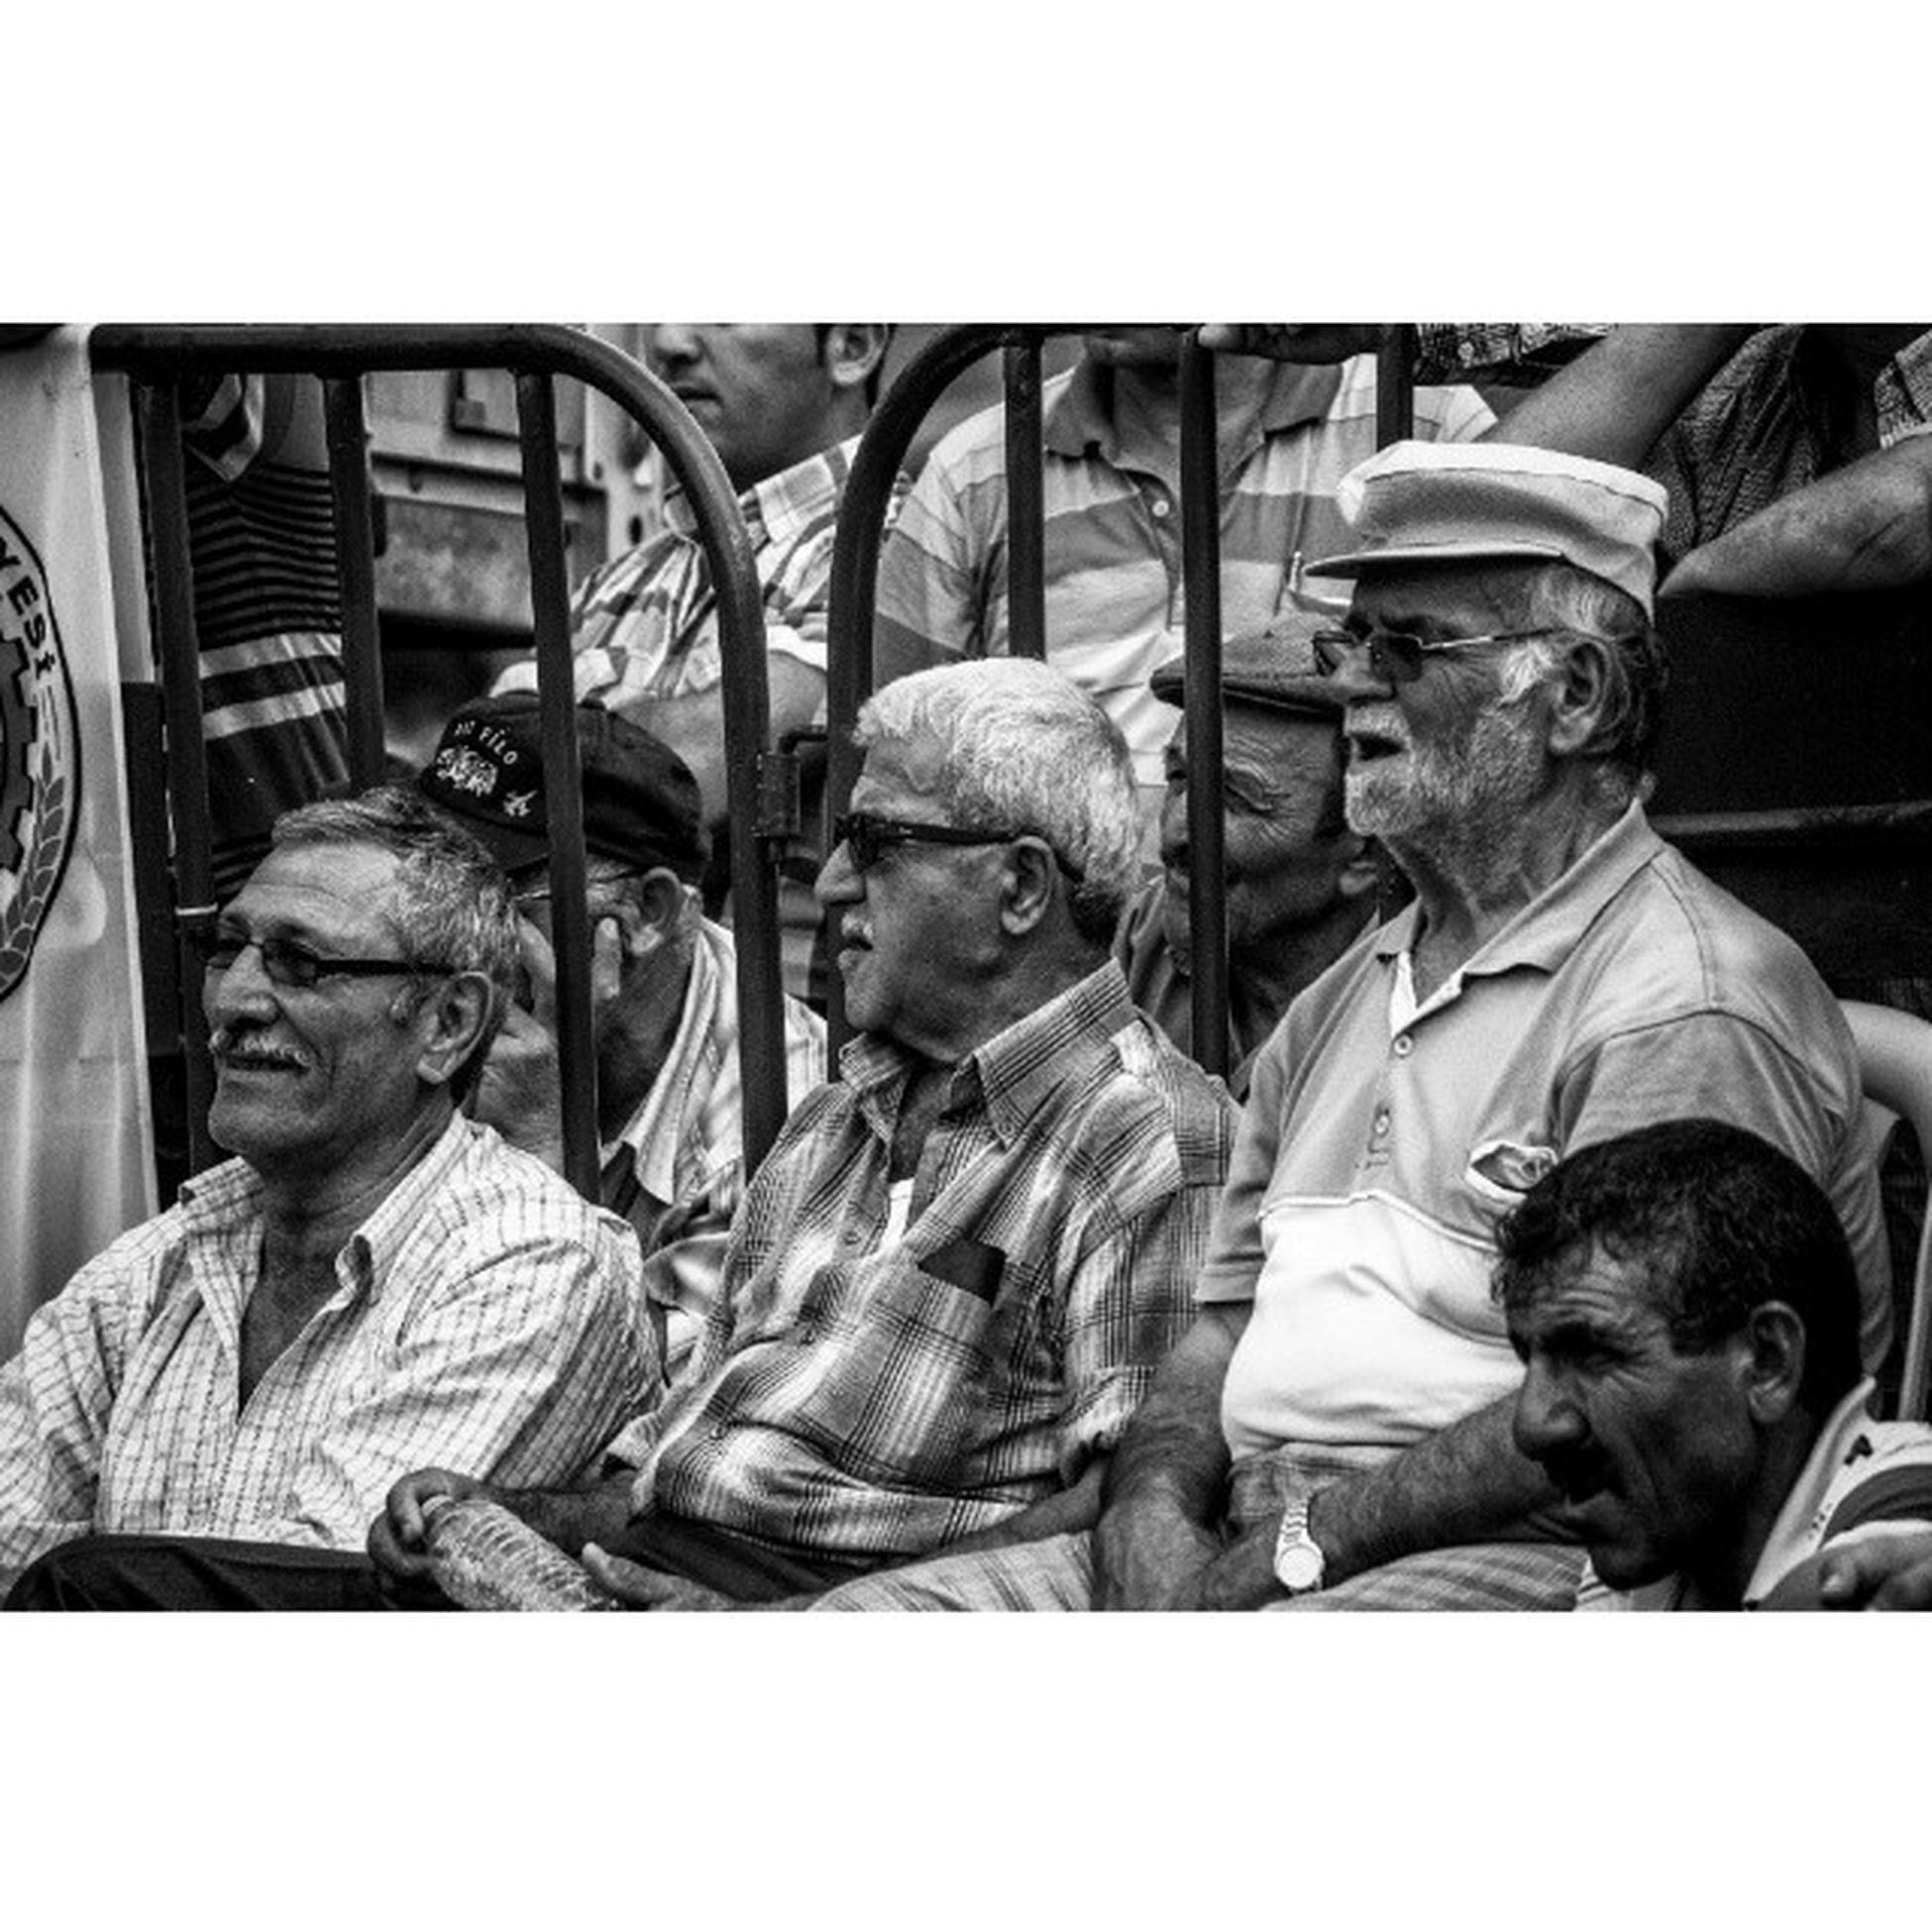 Hayatmavi Seyirci Yokartik Me monochoreme mobilphotograpy manzara instagram atlagel